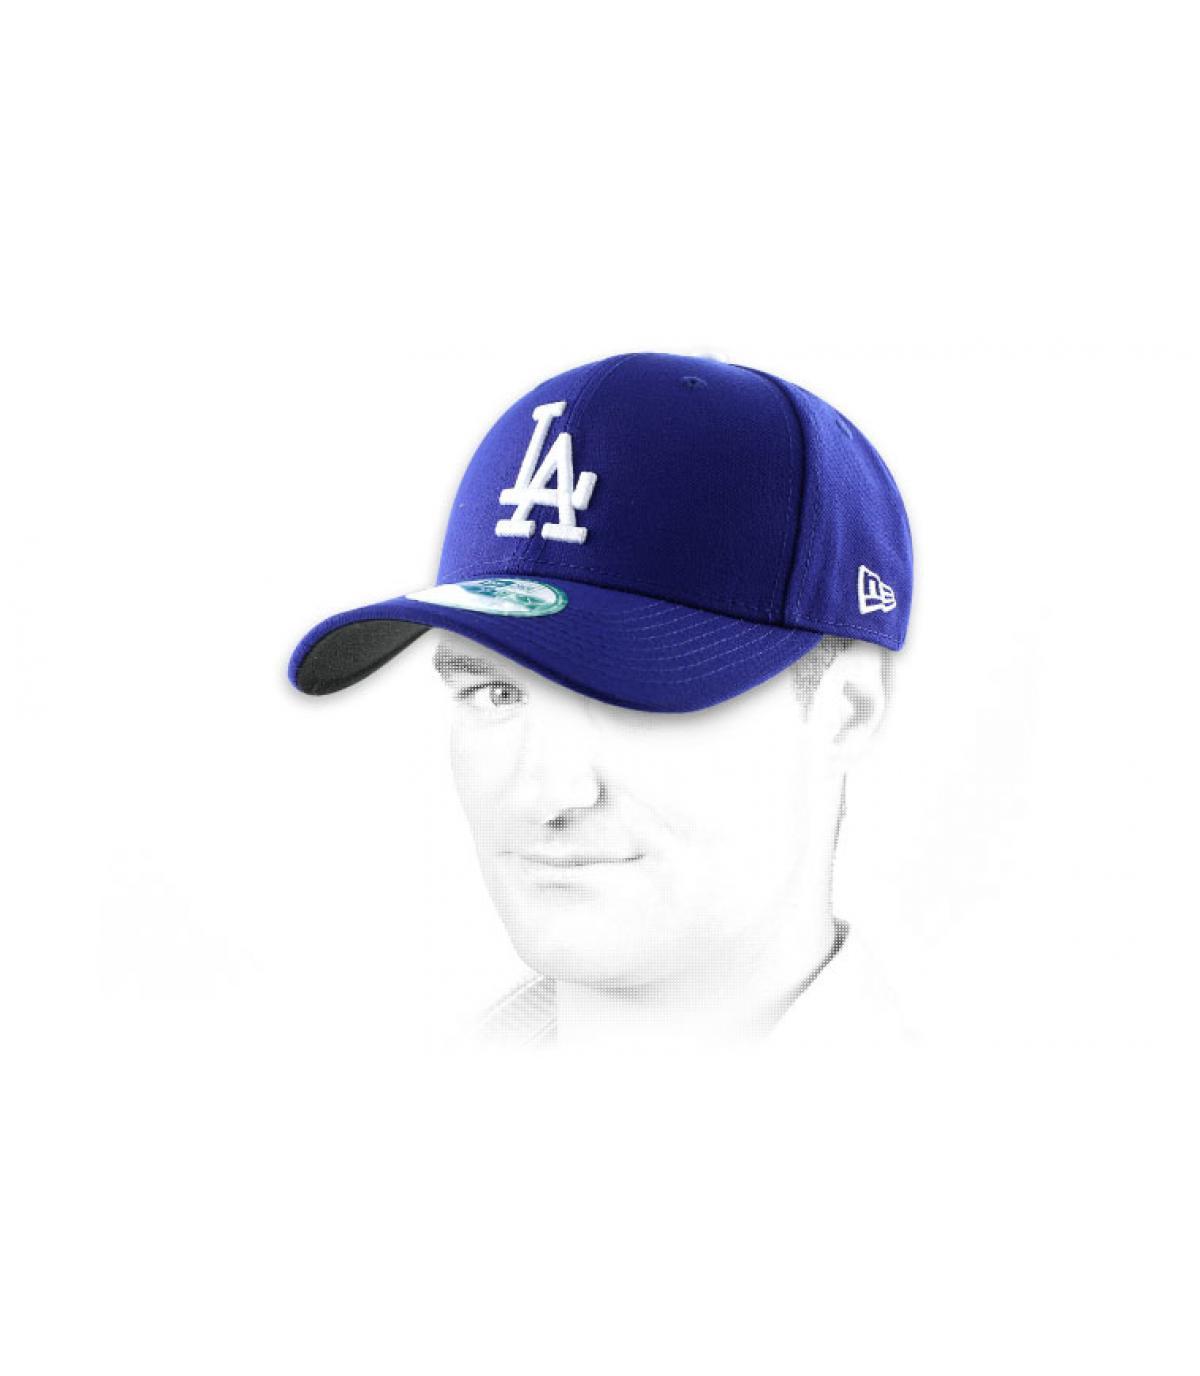 Gorra de béisbol Los Angeles